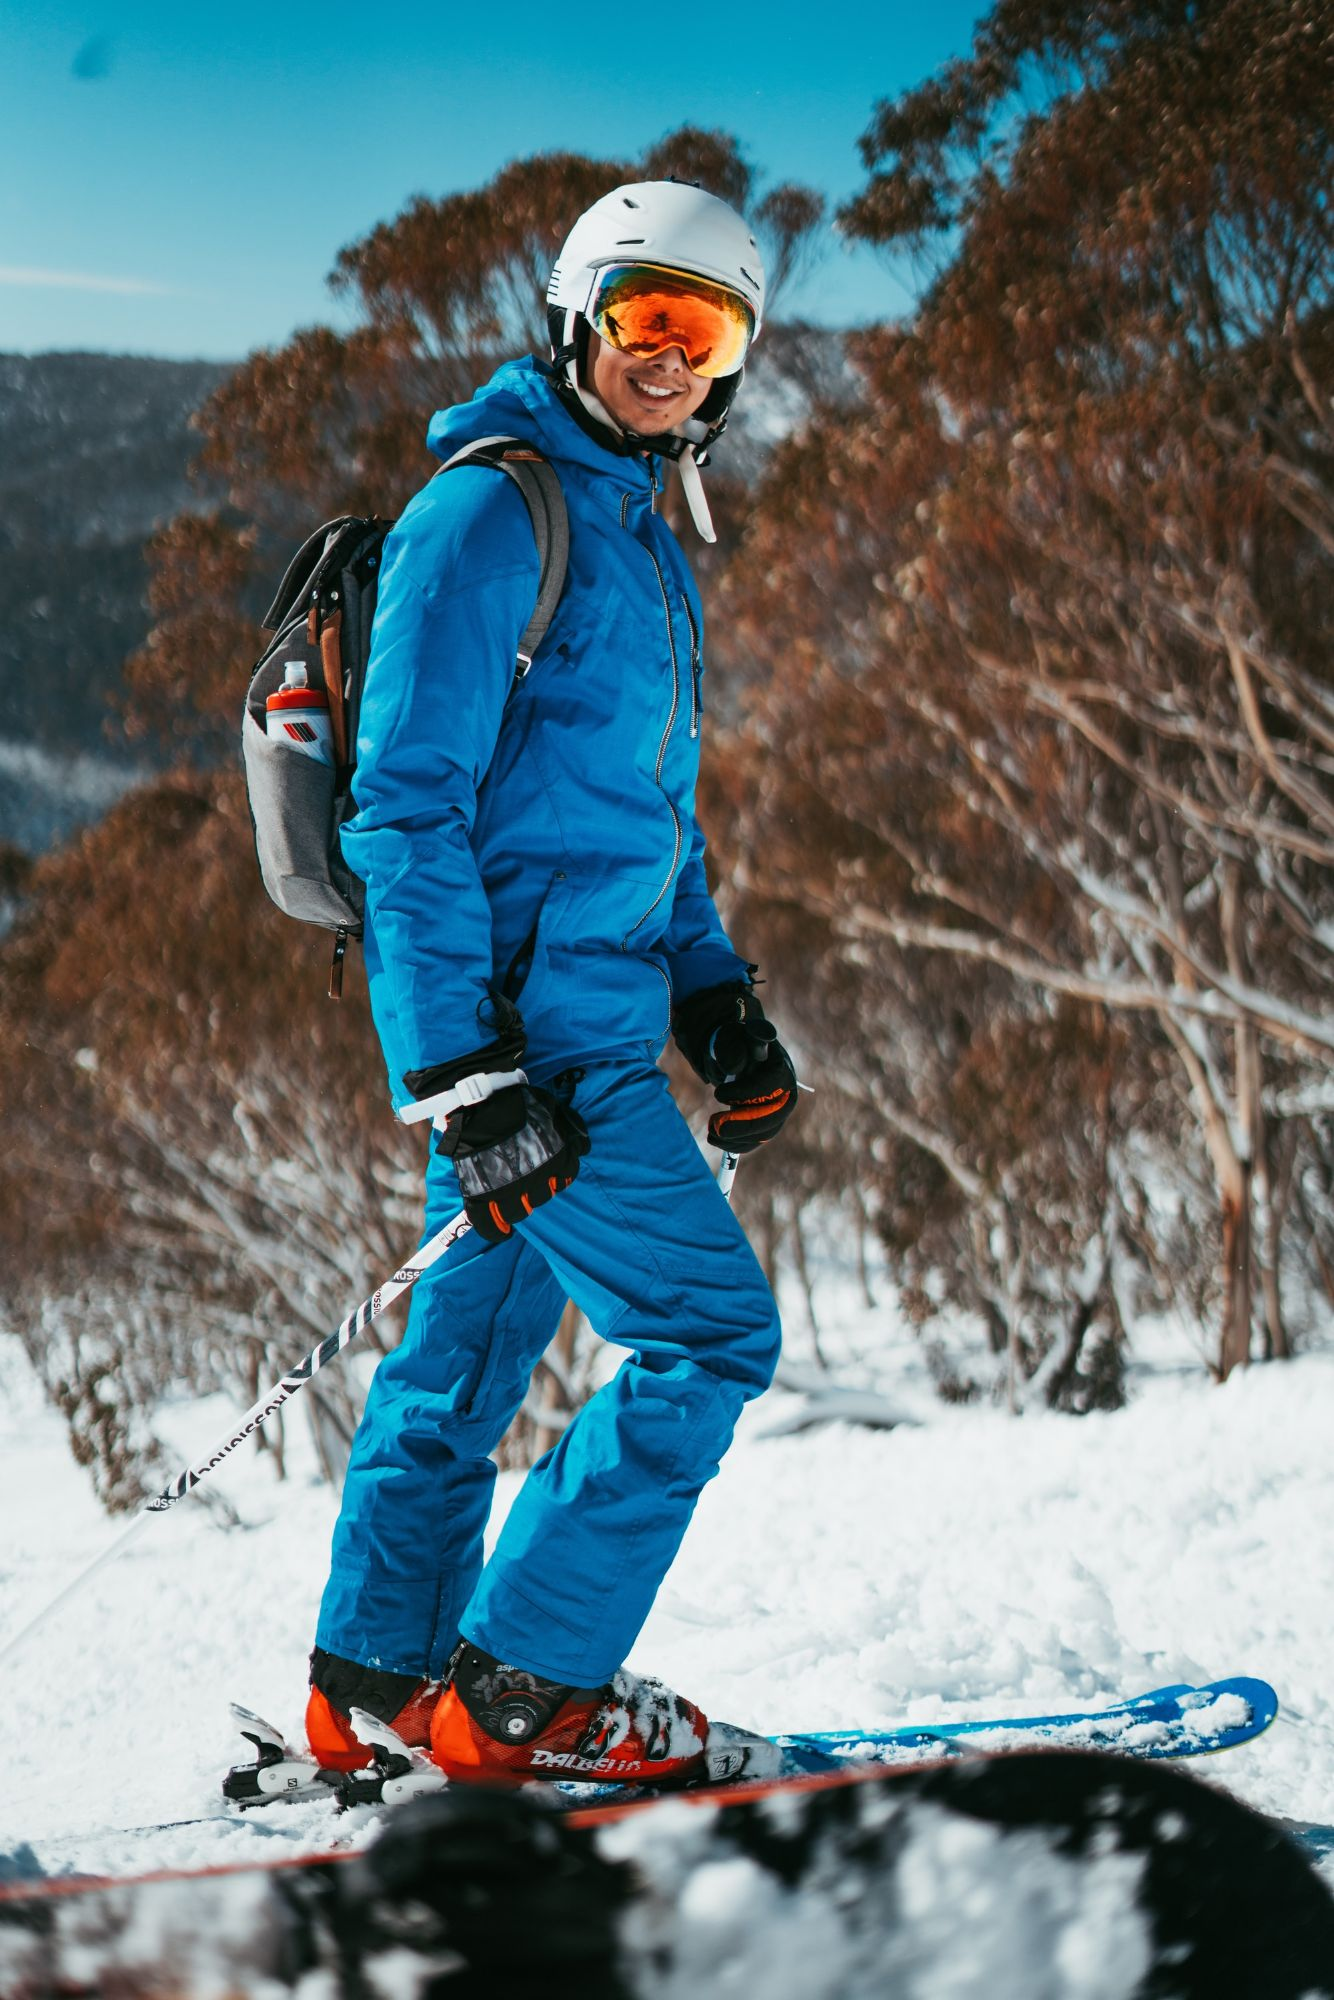 Ski Wear Cleaning Acton W3